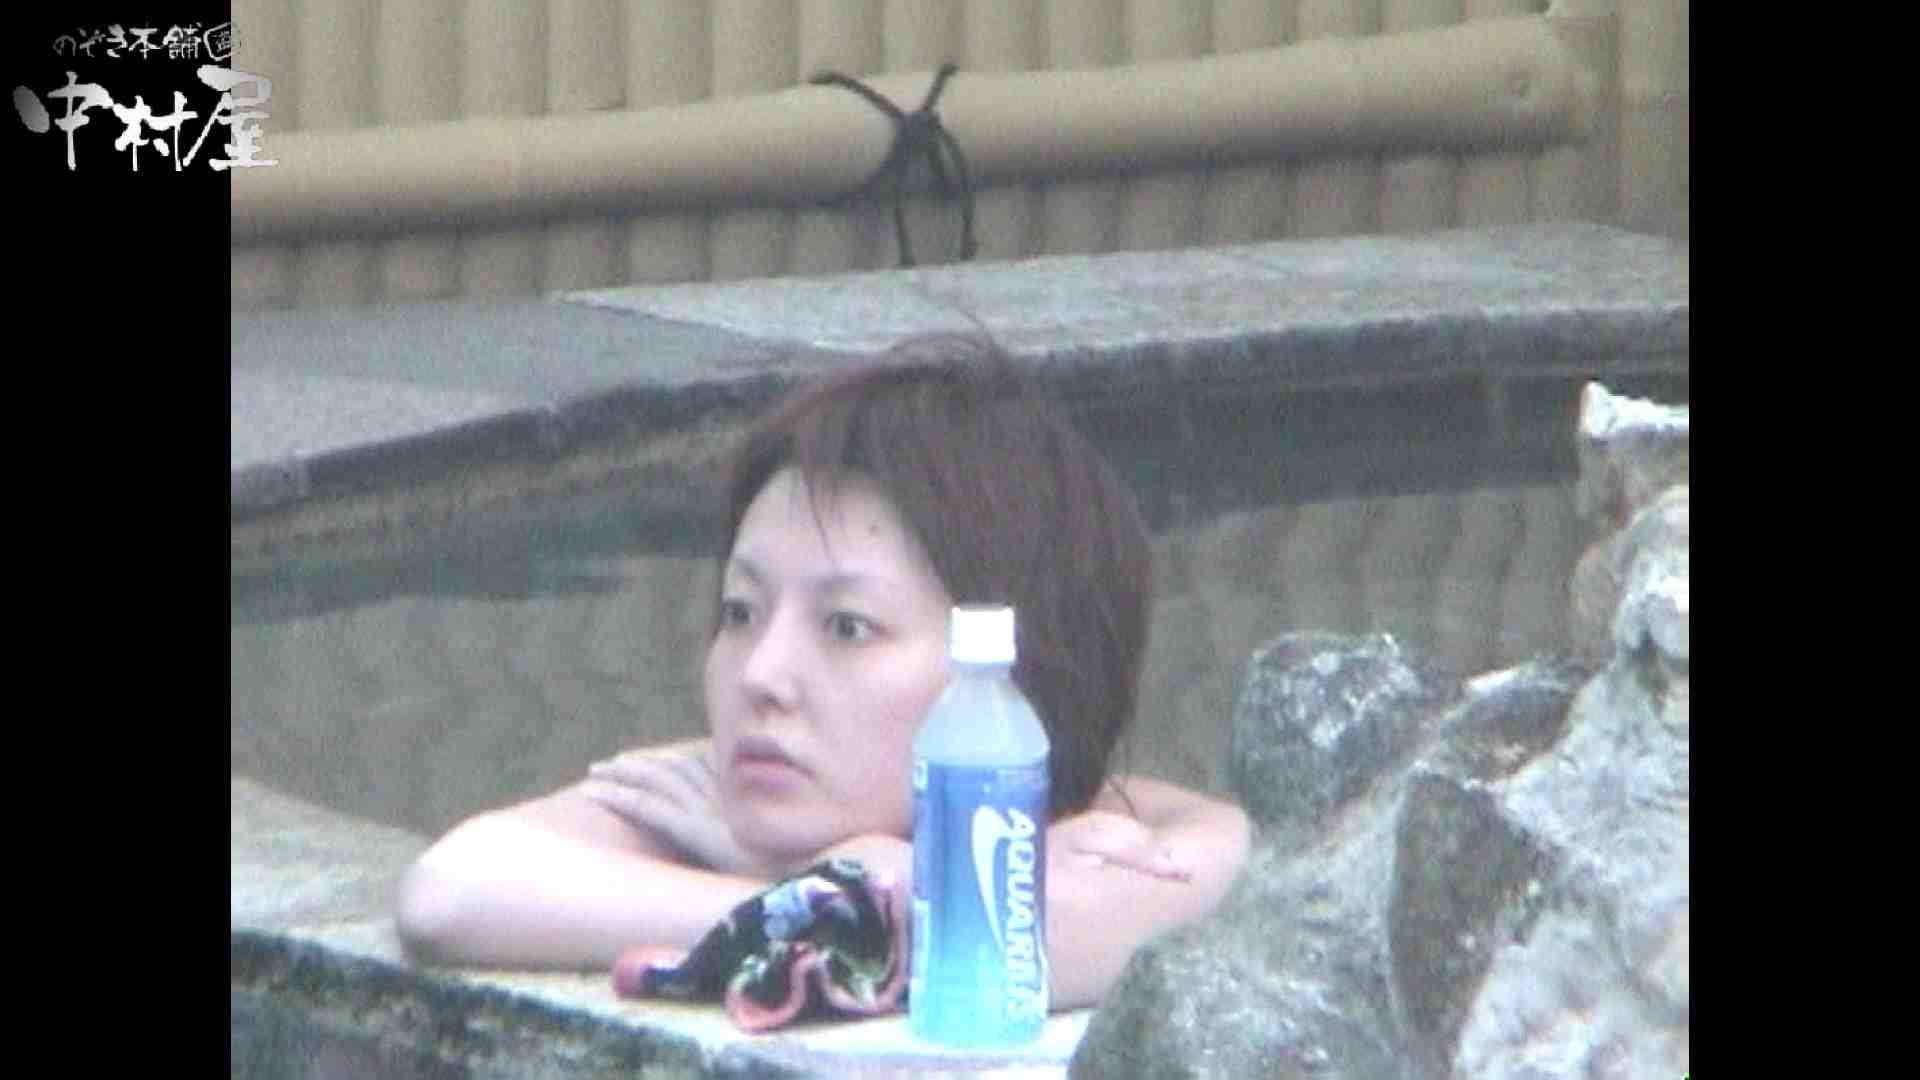 Aquaな露天風呂Vol.959 OLのプライベート   盗撮特撮  13pic 4